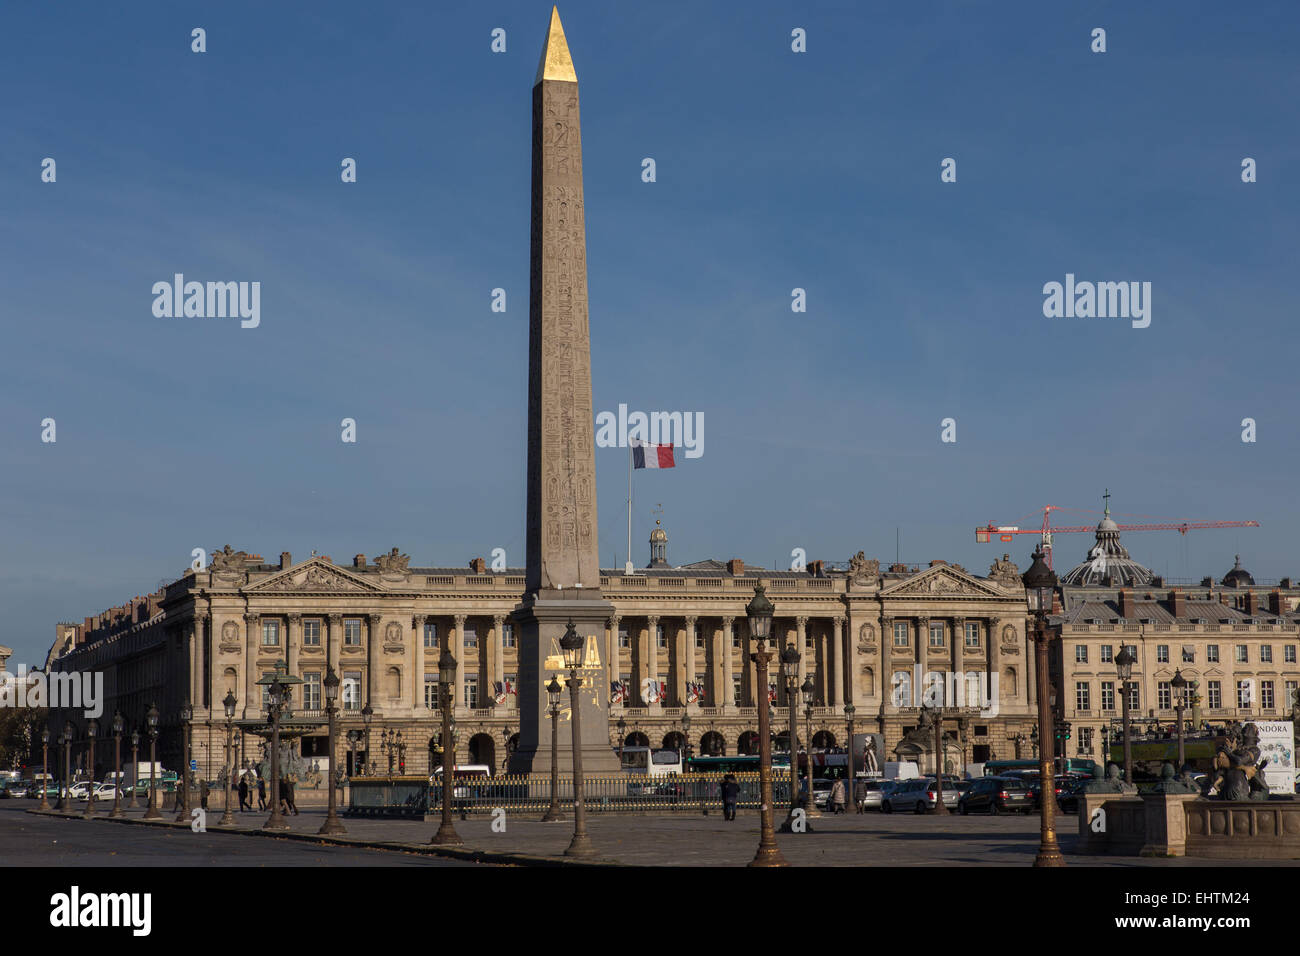 ILLUSTRATION OF THE CITY OF PARIS, ILE-DE-FRANCE, FRANCE - Stock Image